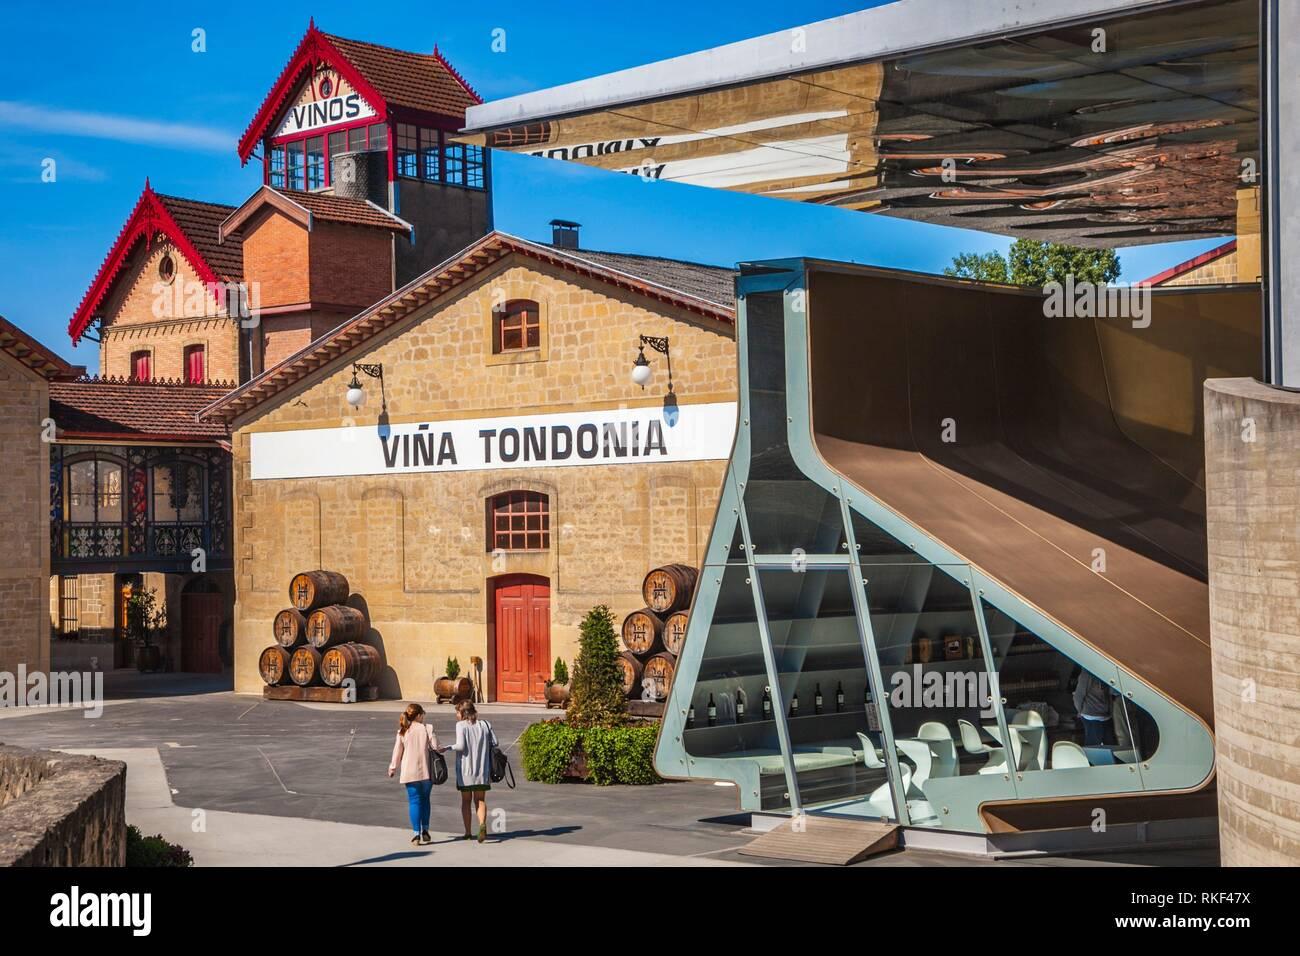 Lopez de Heredia Wine Cellar. Viña Tondonia. In the foreground, design by Zaha Hadid. In the background,Traditional modernist wine cellar. Haro. La Stock Photo